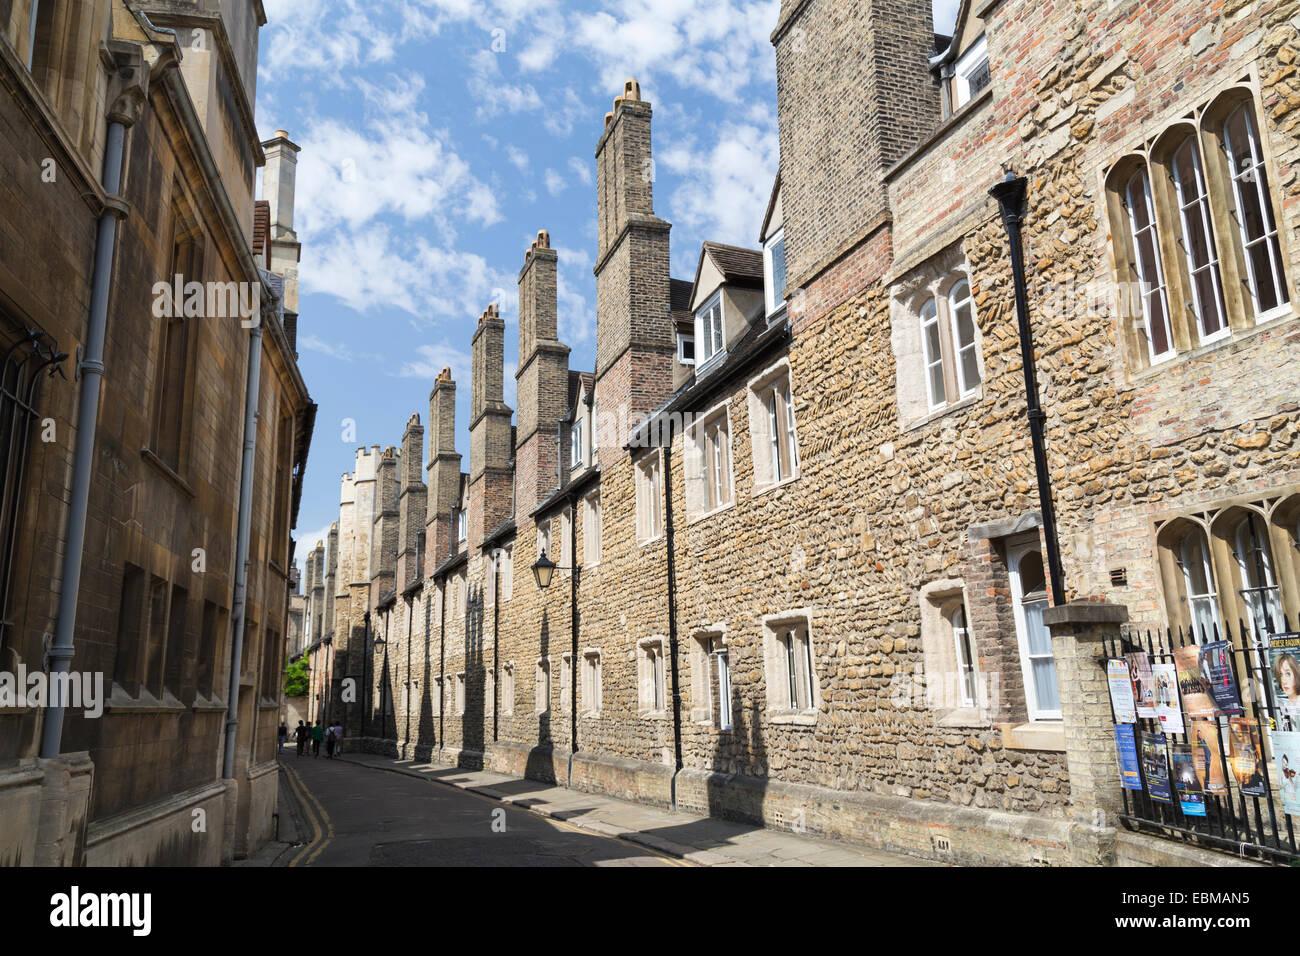 UK, Cambridge, Trinity Lane and Trinity college buildings. - Stock Image